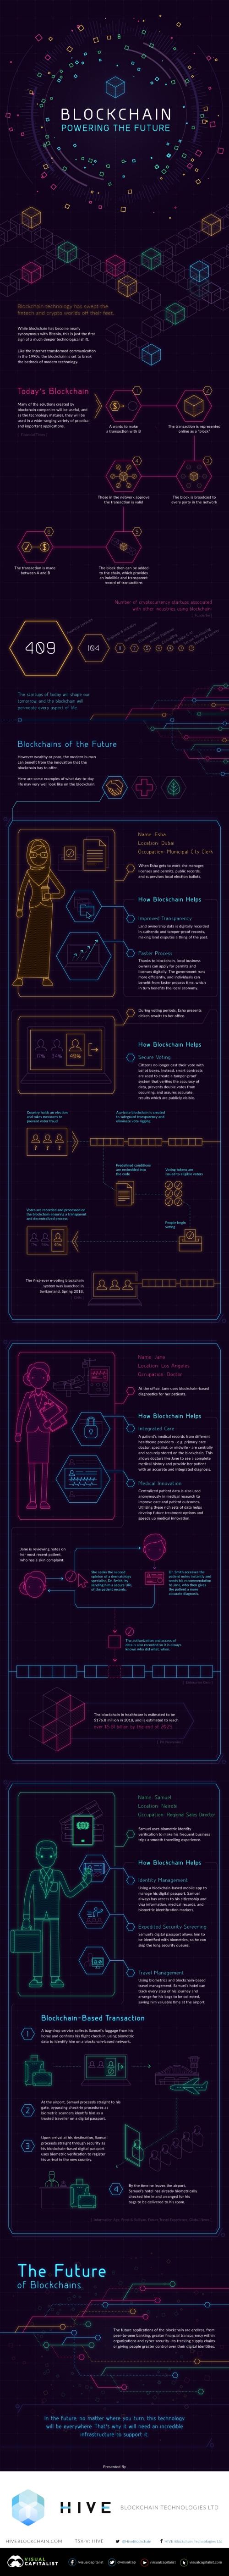 blockchain-powering-the-future